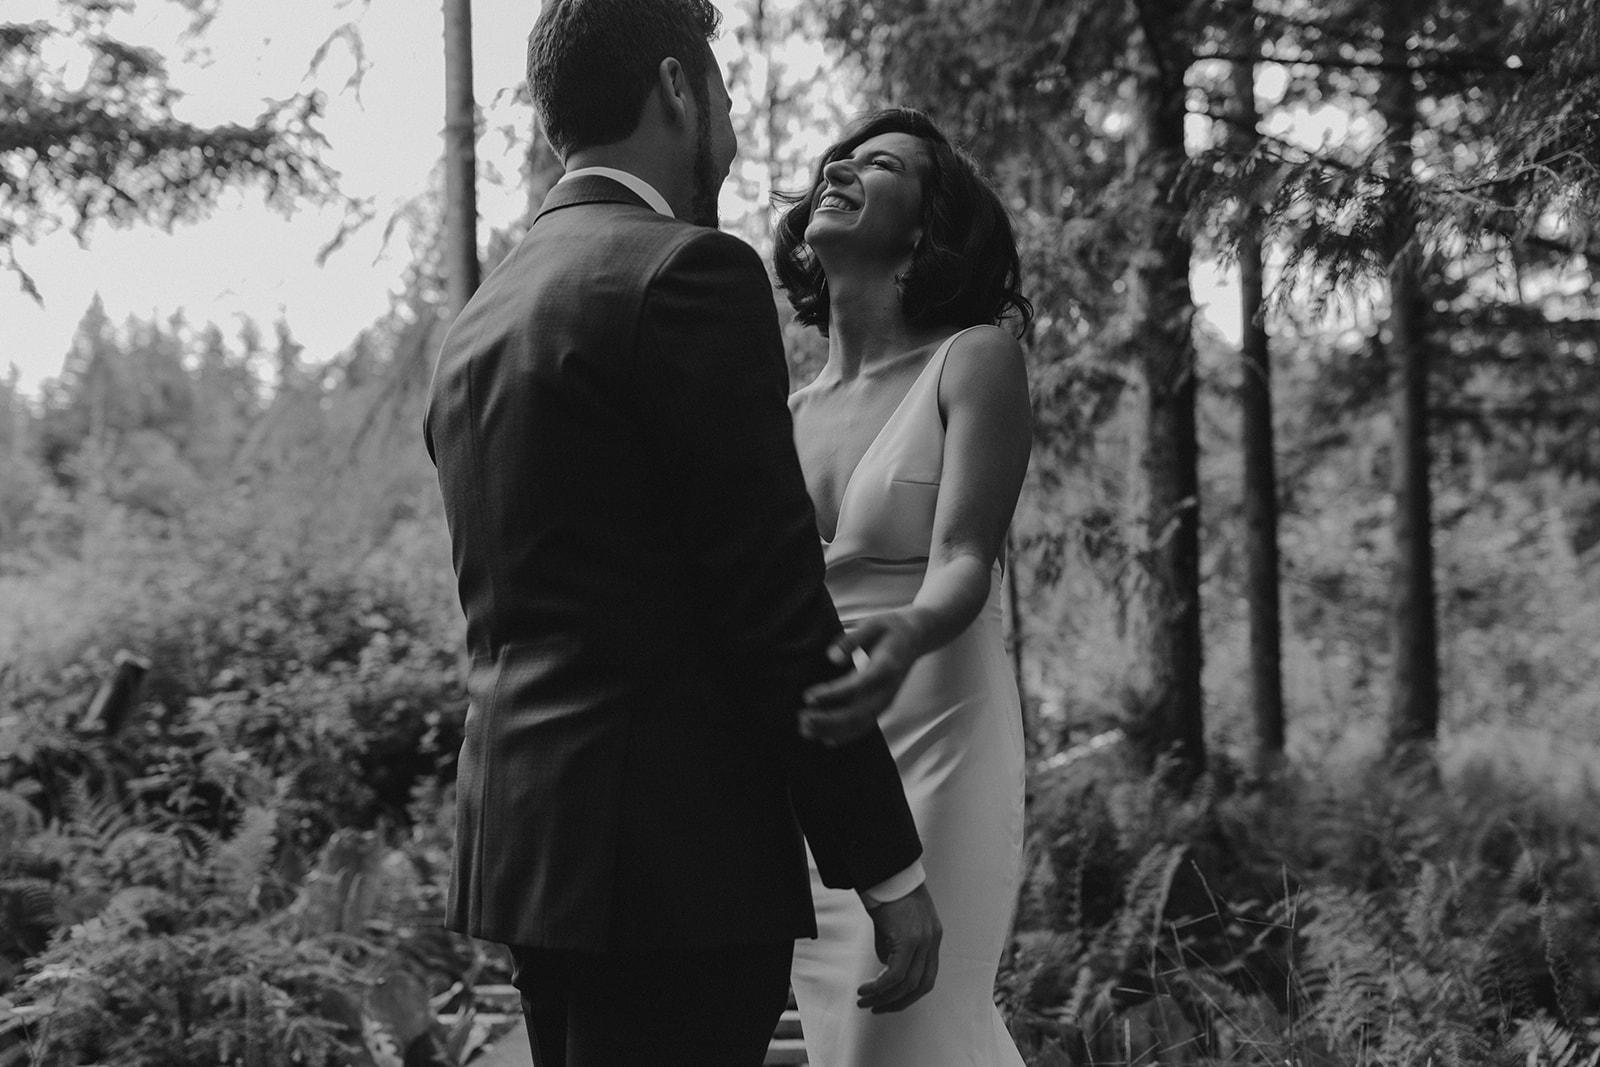 cortney_skye_wedding_june2019-78.jpg